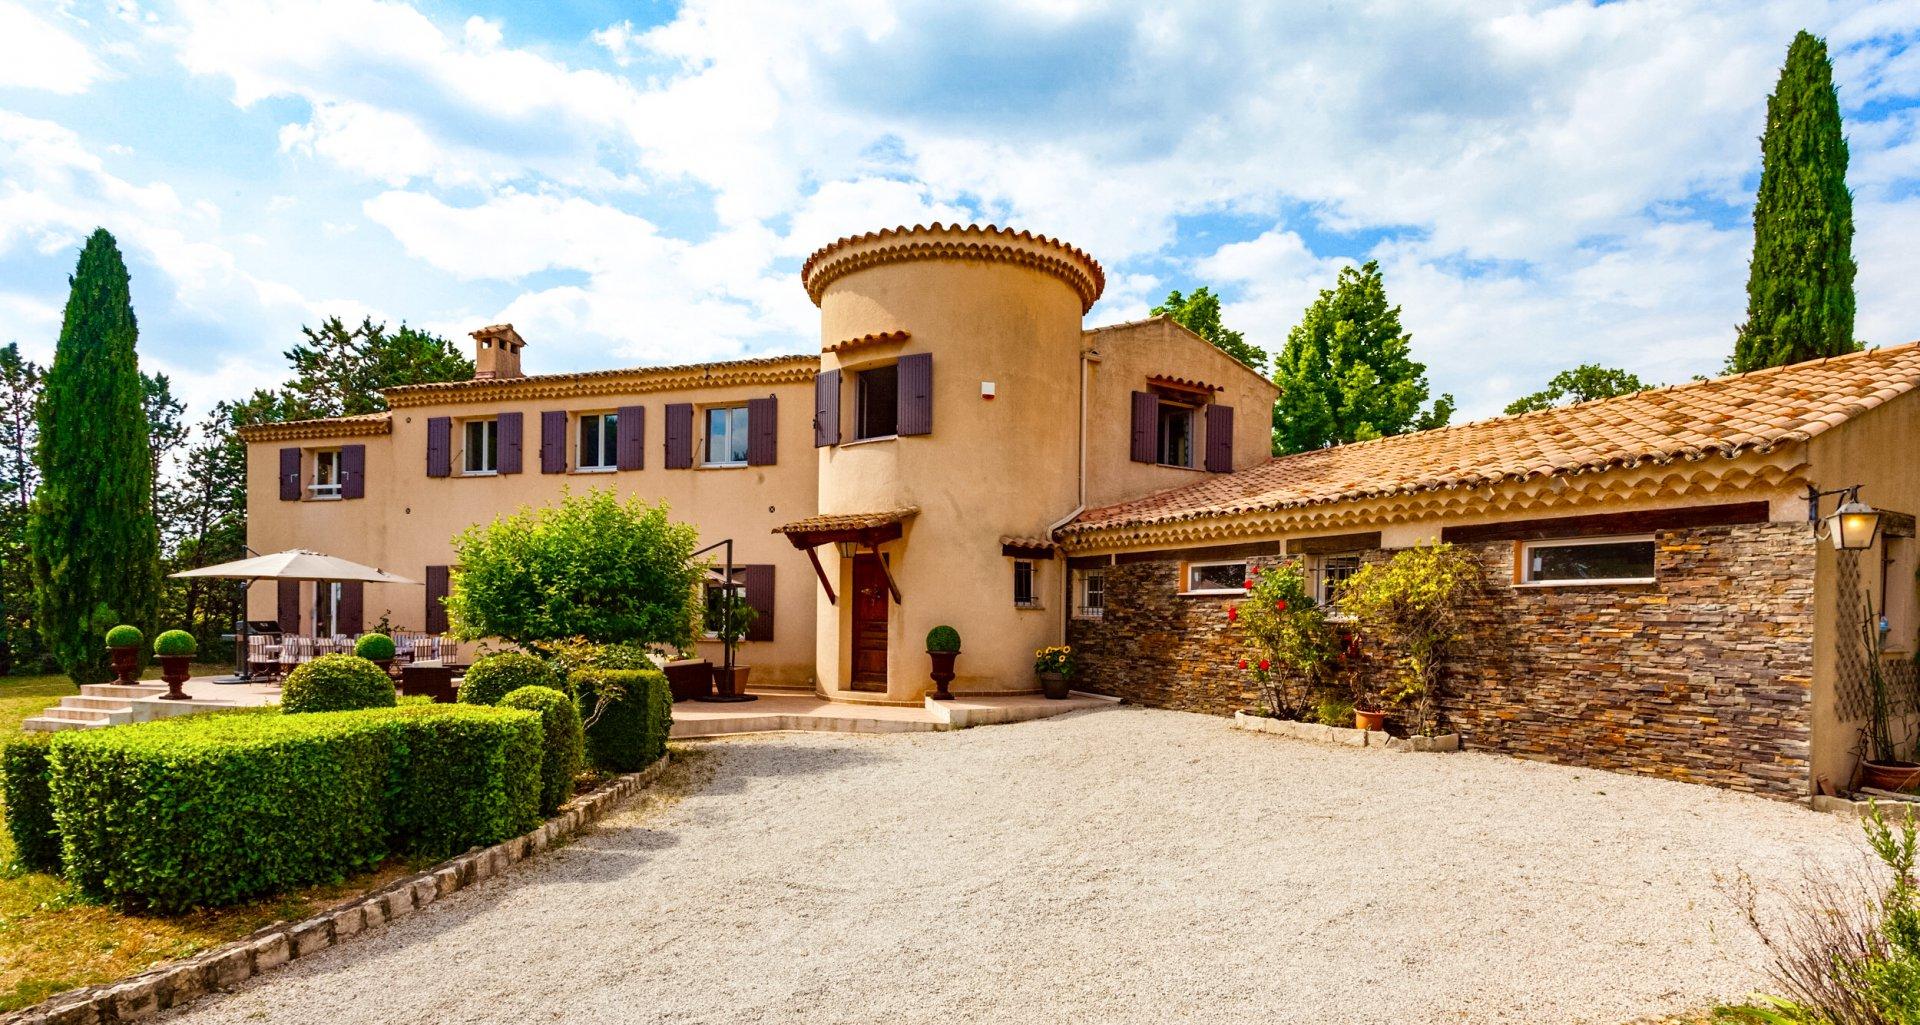 Aix en provence location villa luxe provence avec piscine privee for Villa de luxe canada